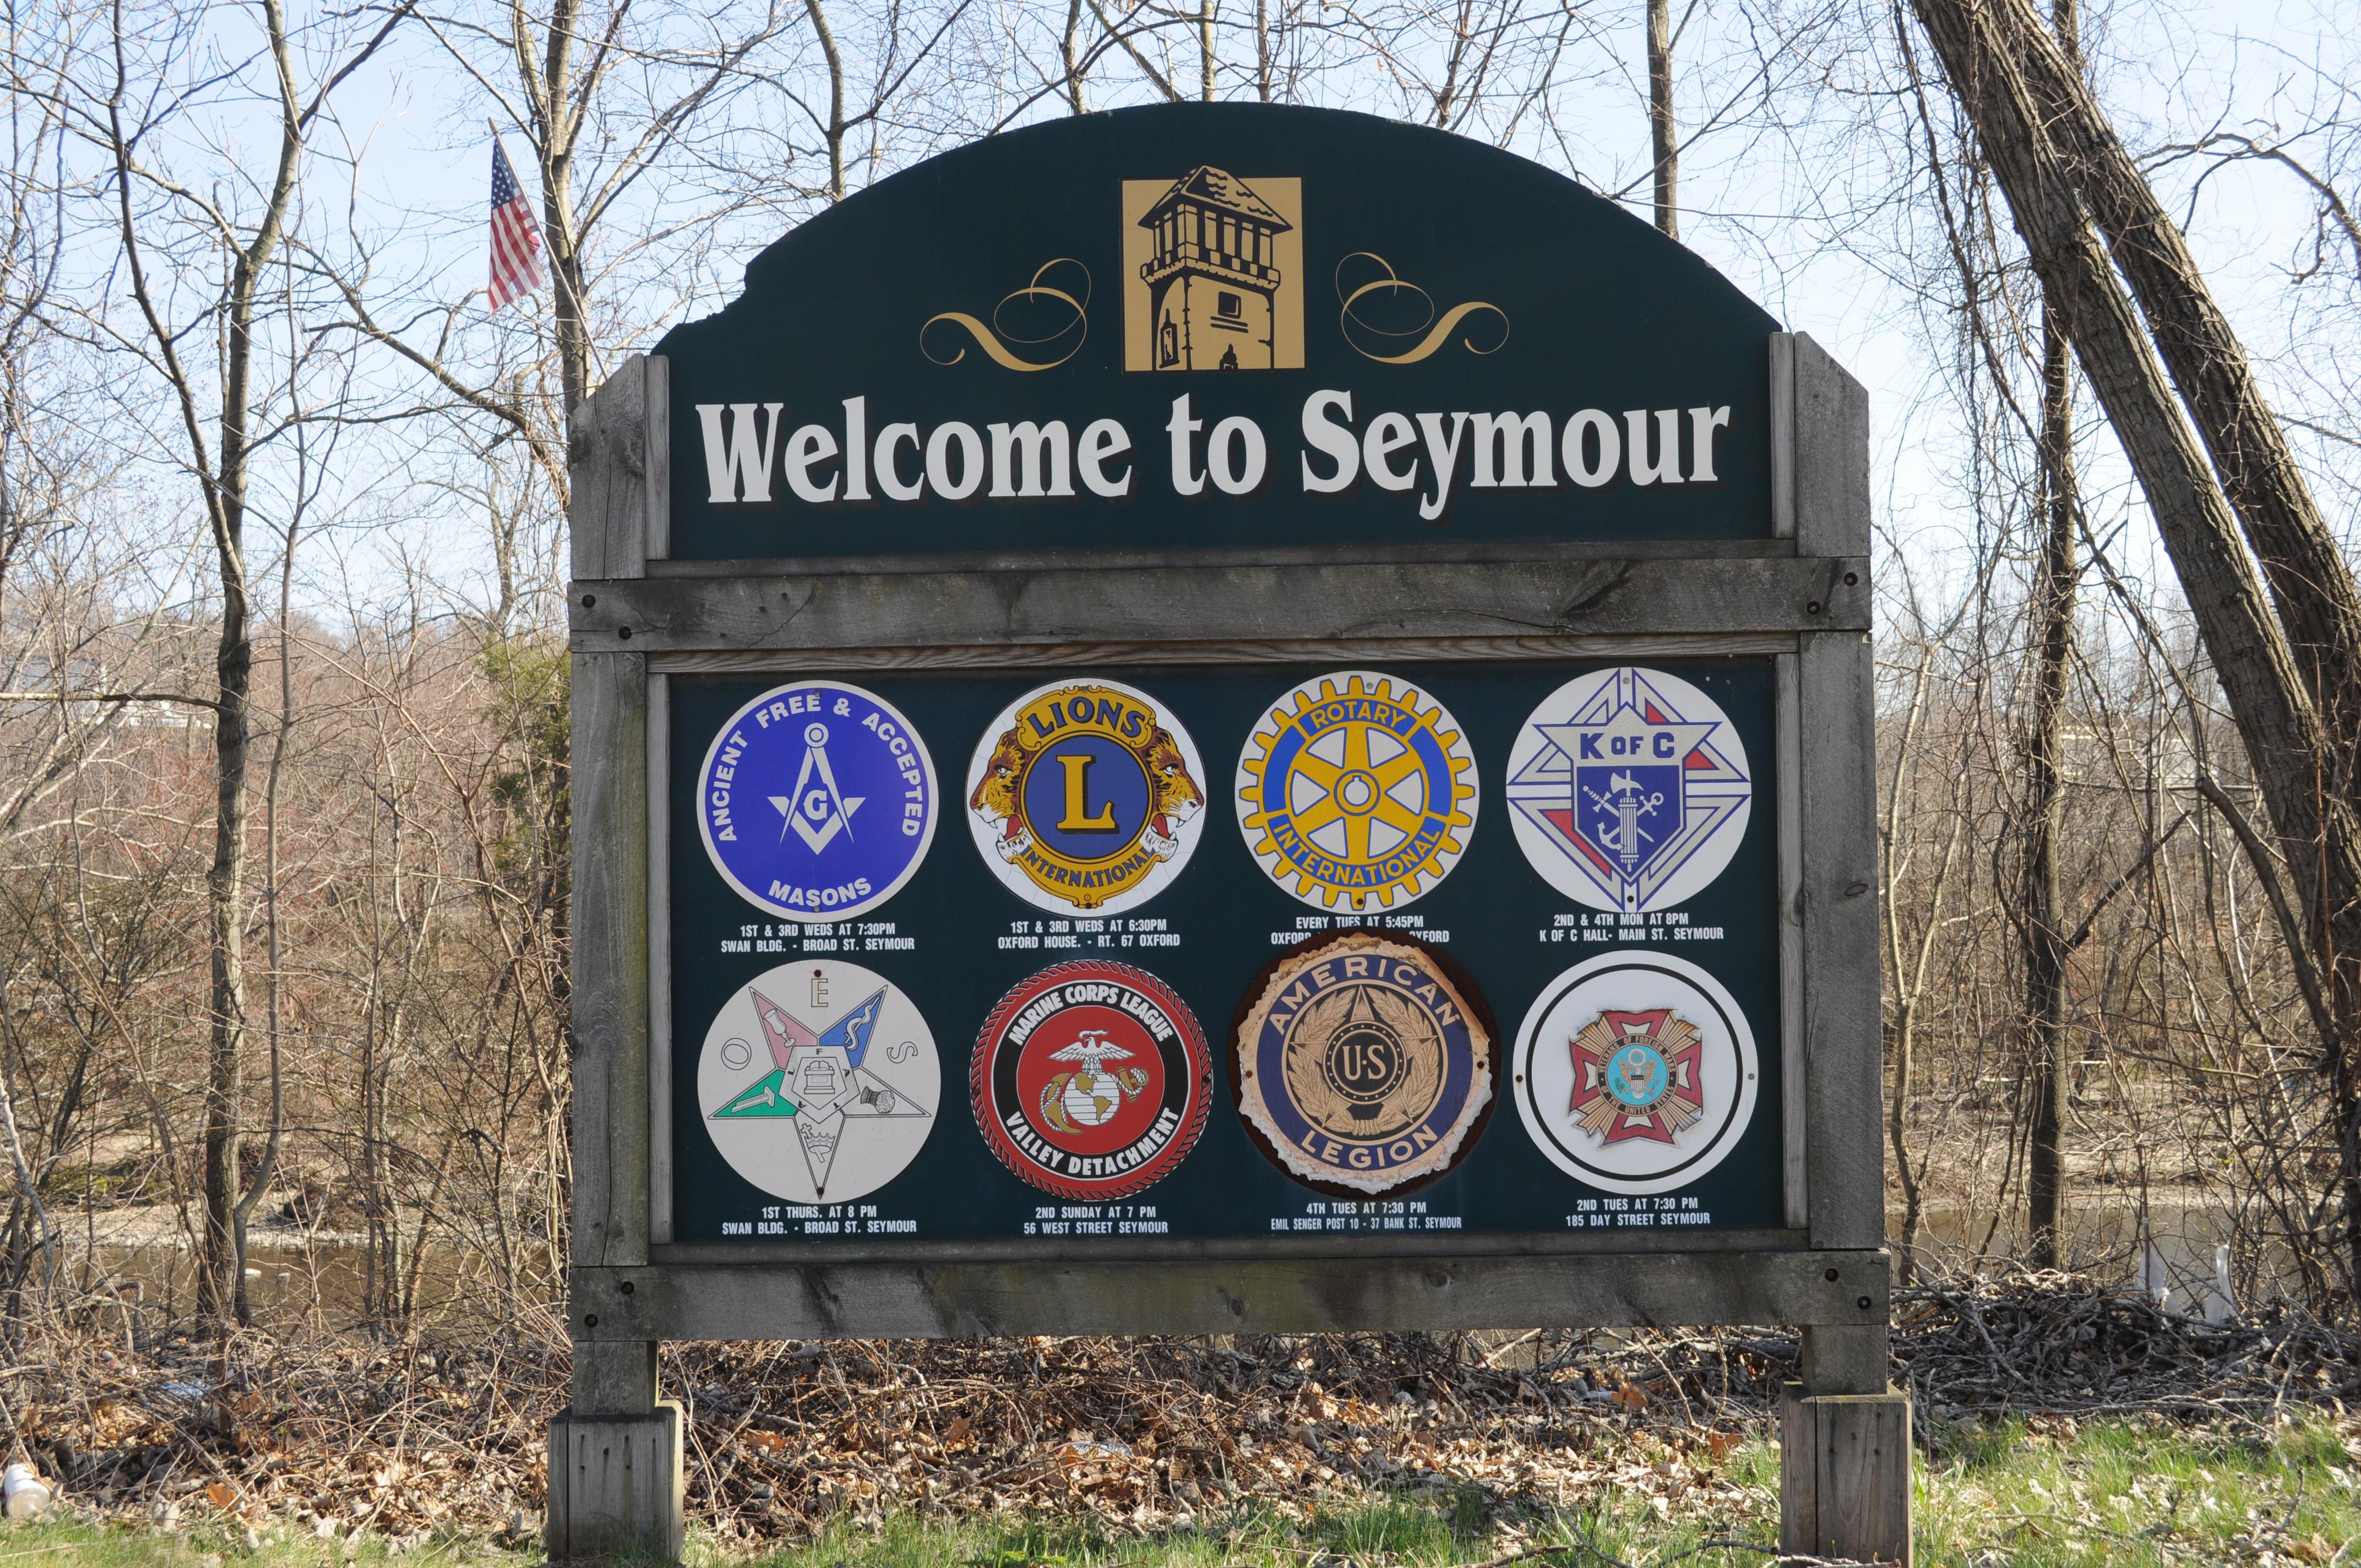 Gay matchmaking service in south lyon michigan